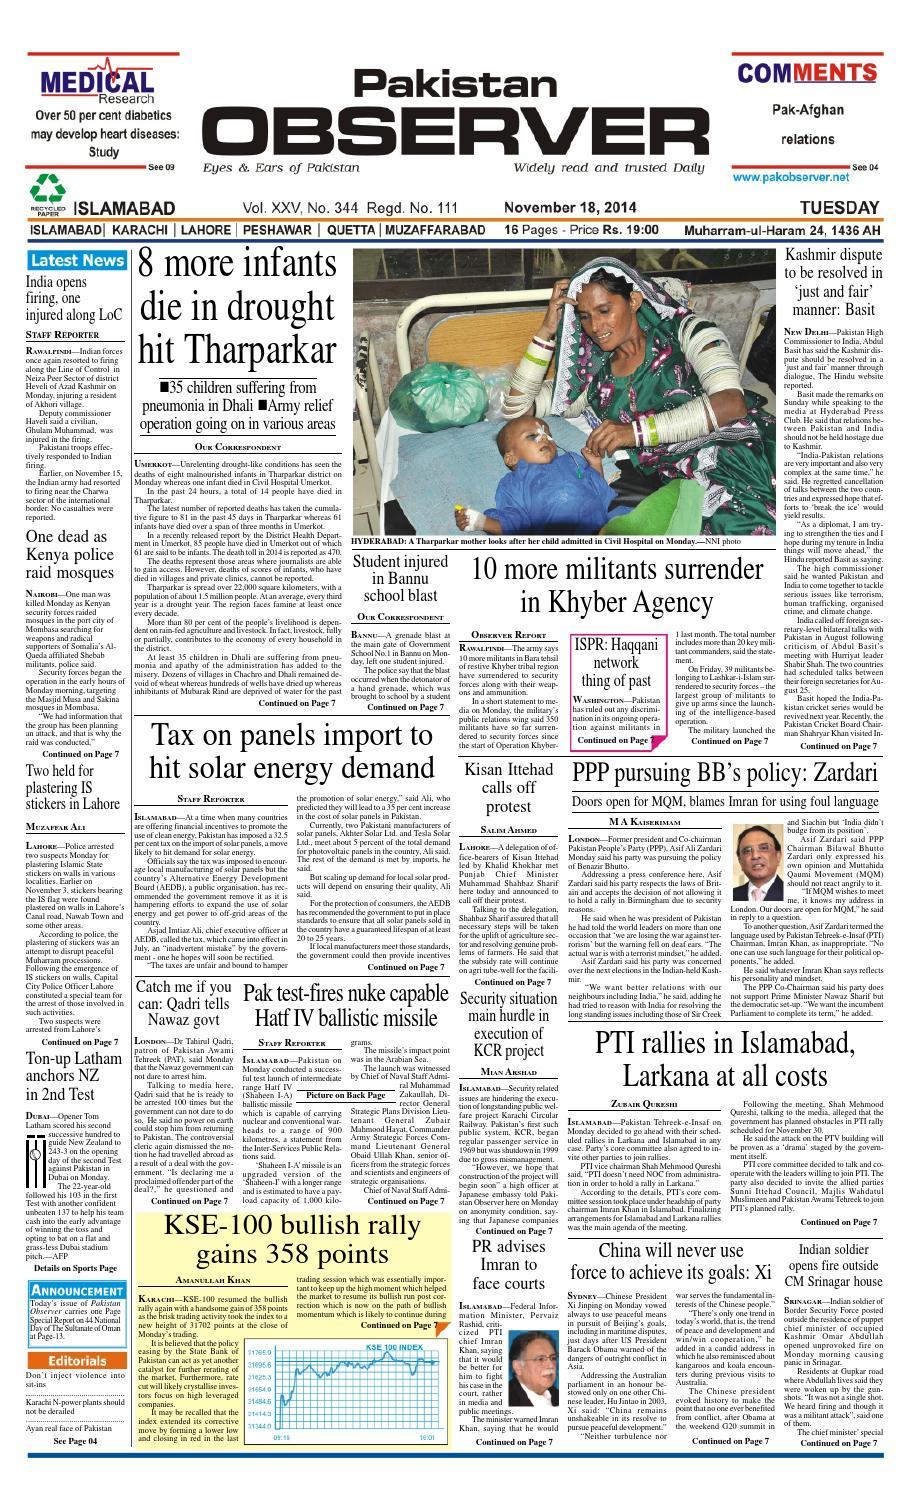 Ep18nov2014 by Pakistan Observer - issuu